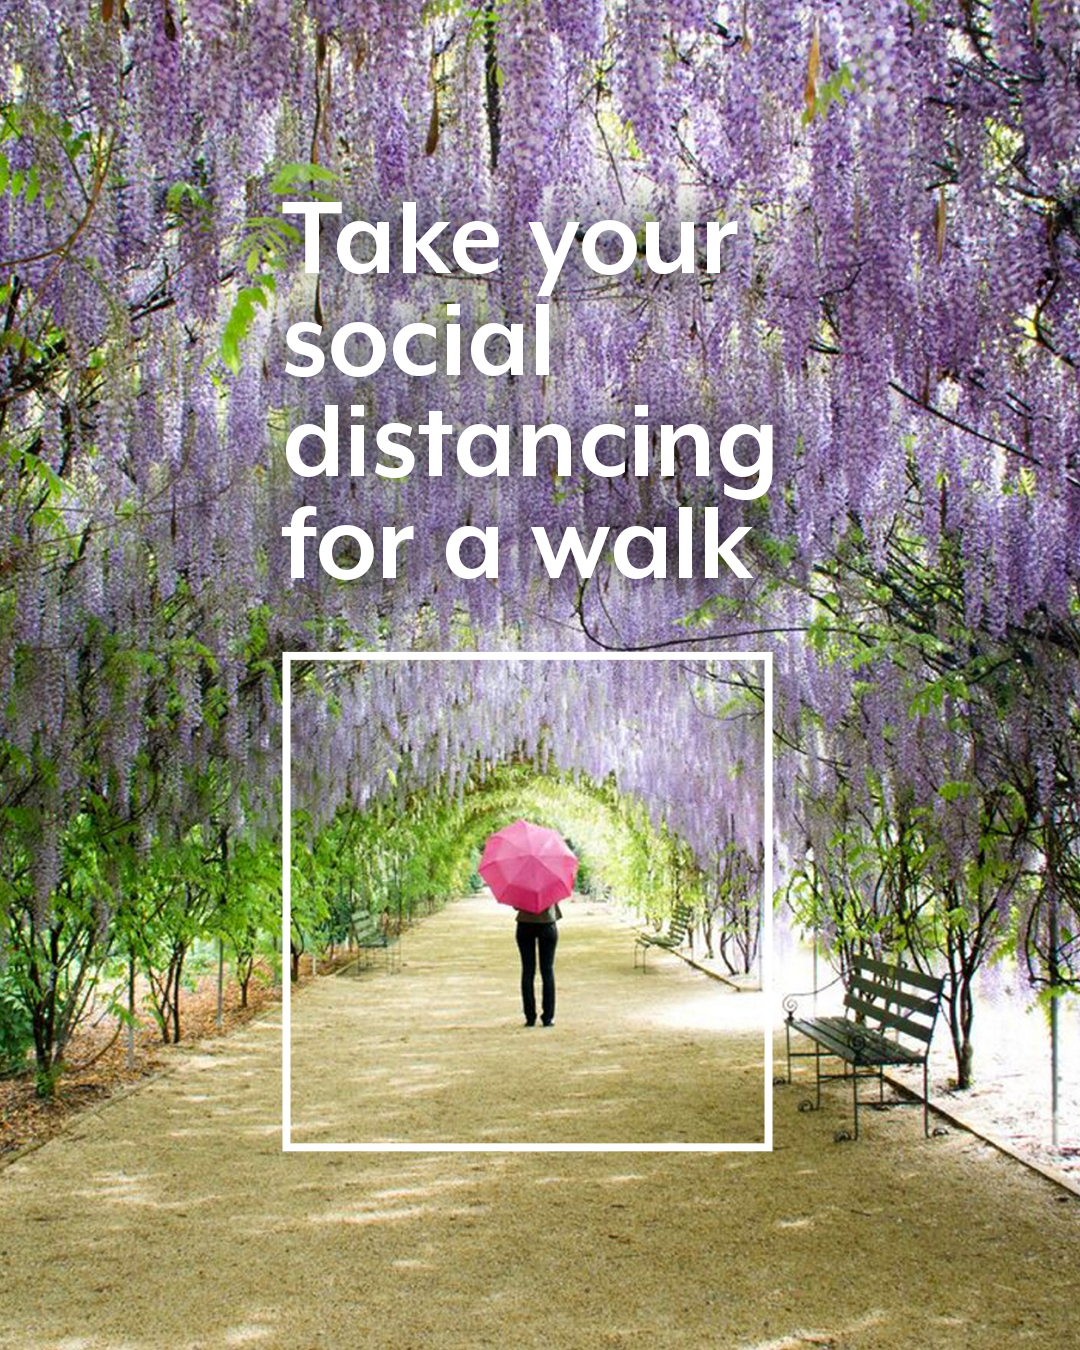 SAT40418_SocialPost_Botanic Gardens_01